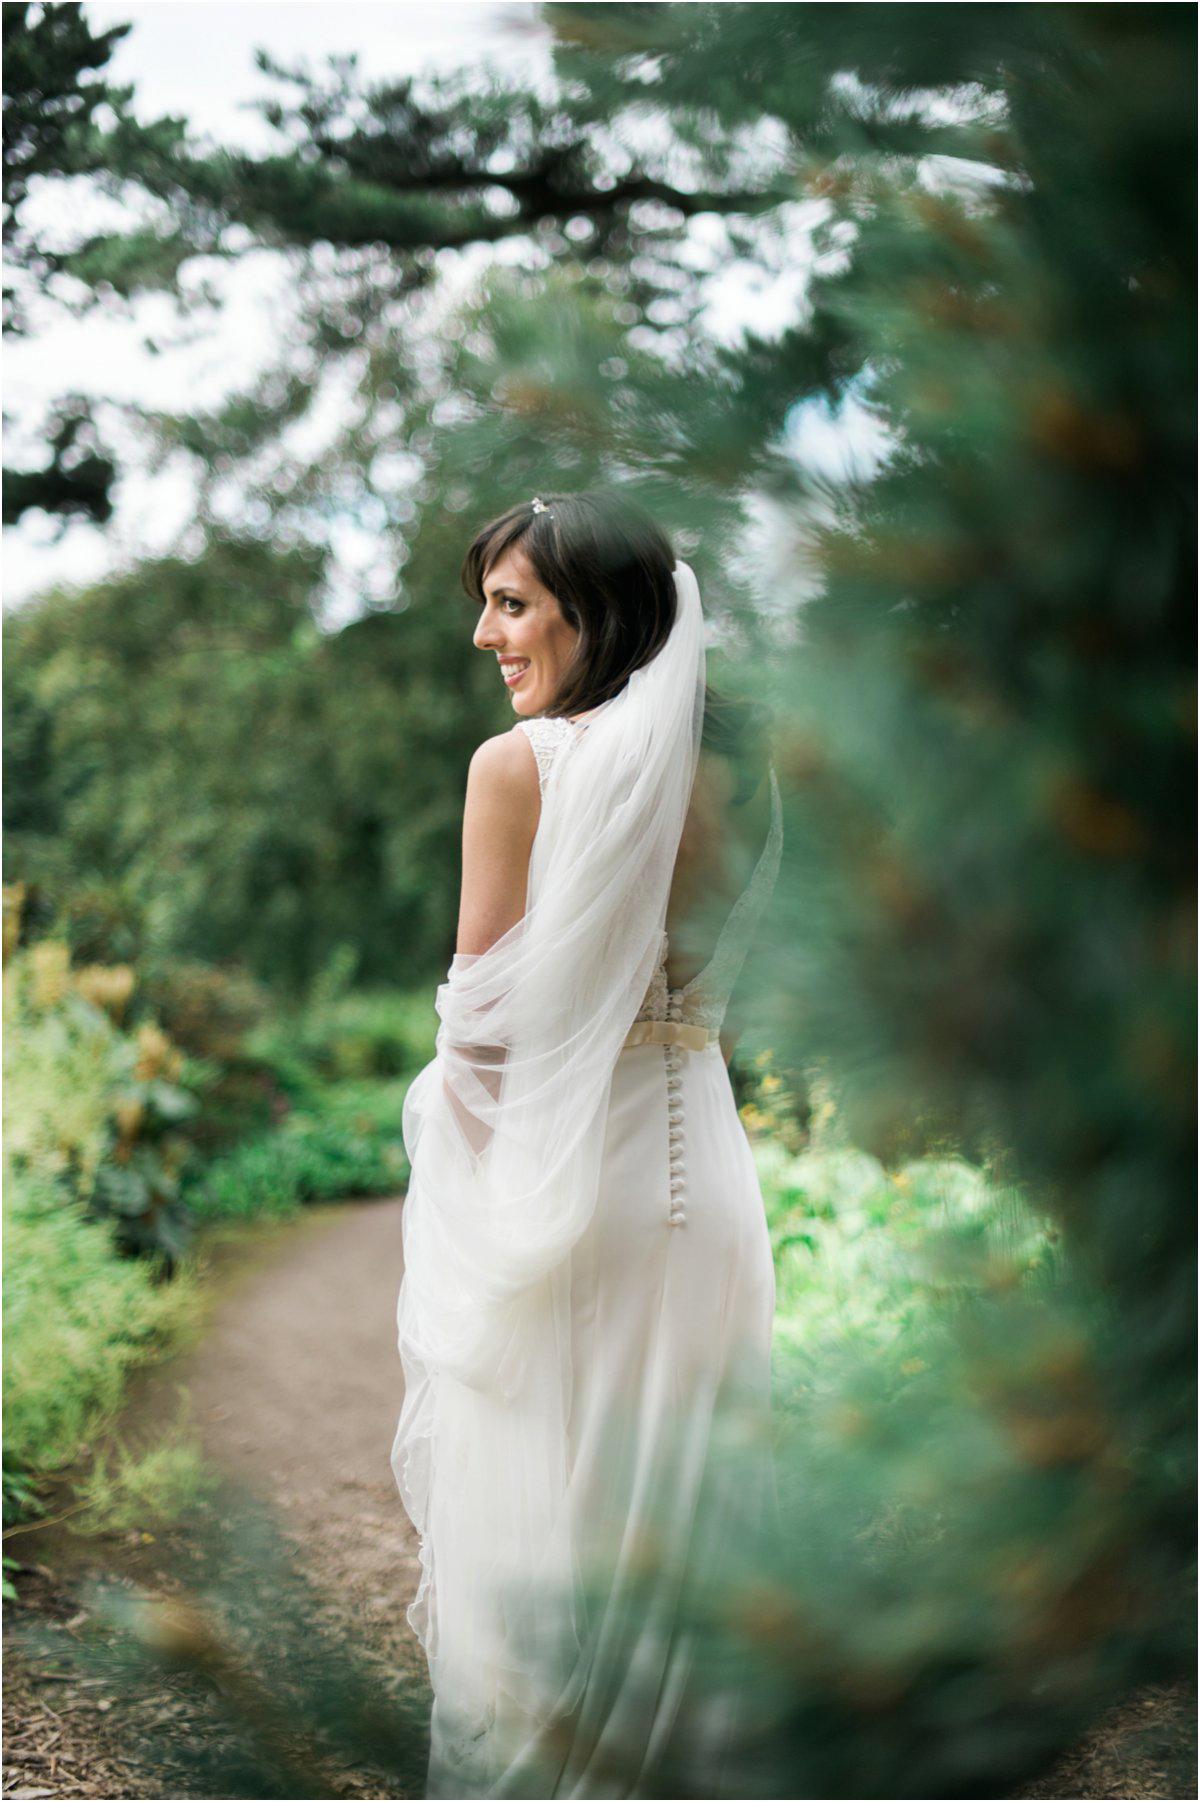 Botanic_Gardens_Edinburgh_Wedding_photography-14.jpg